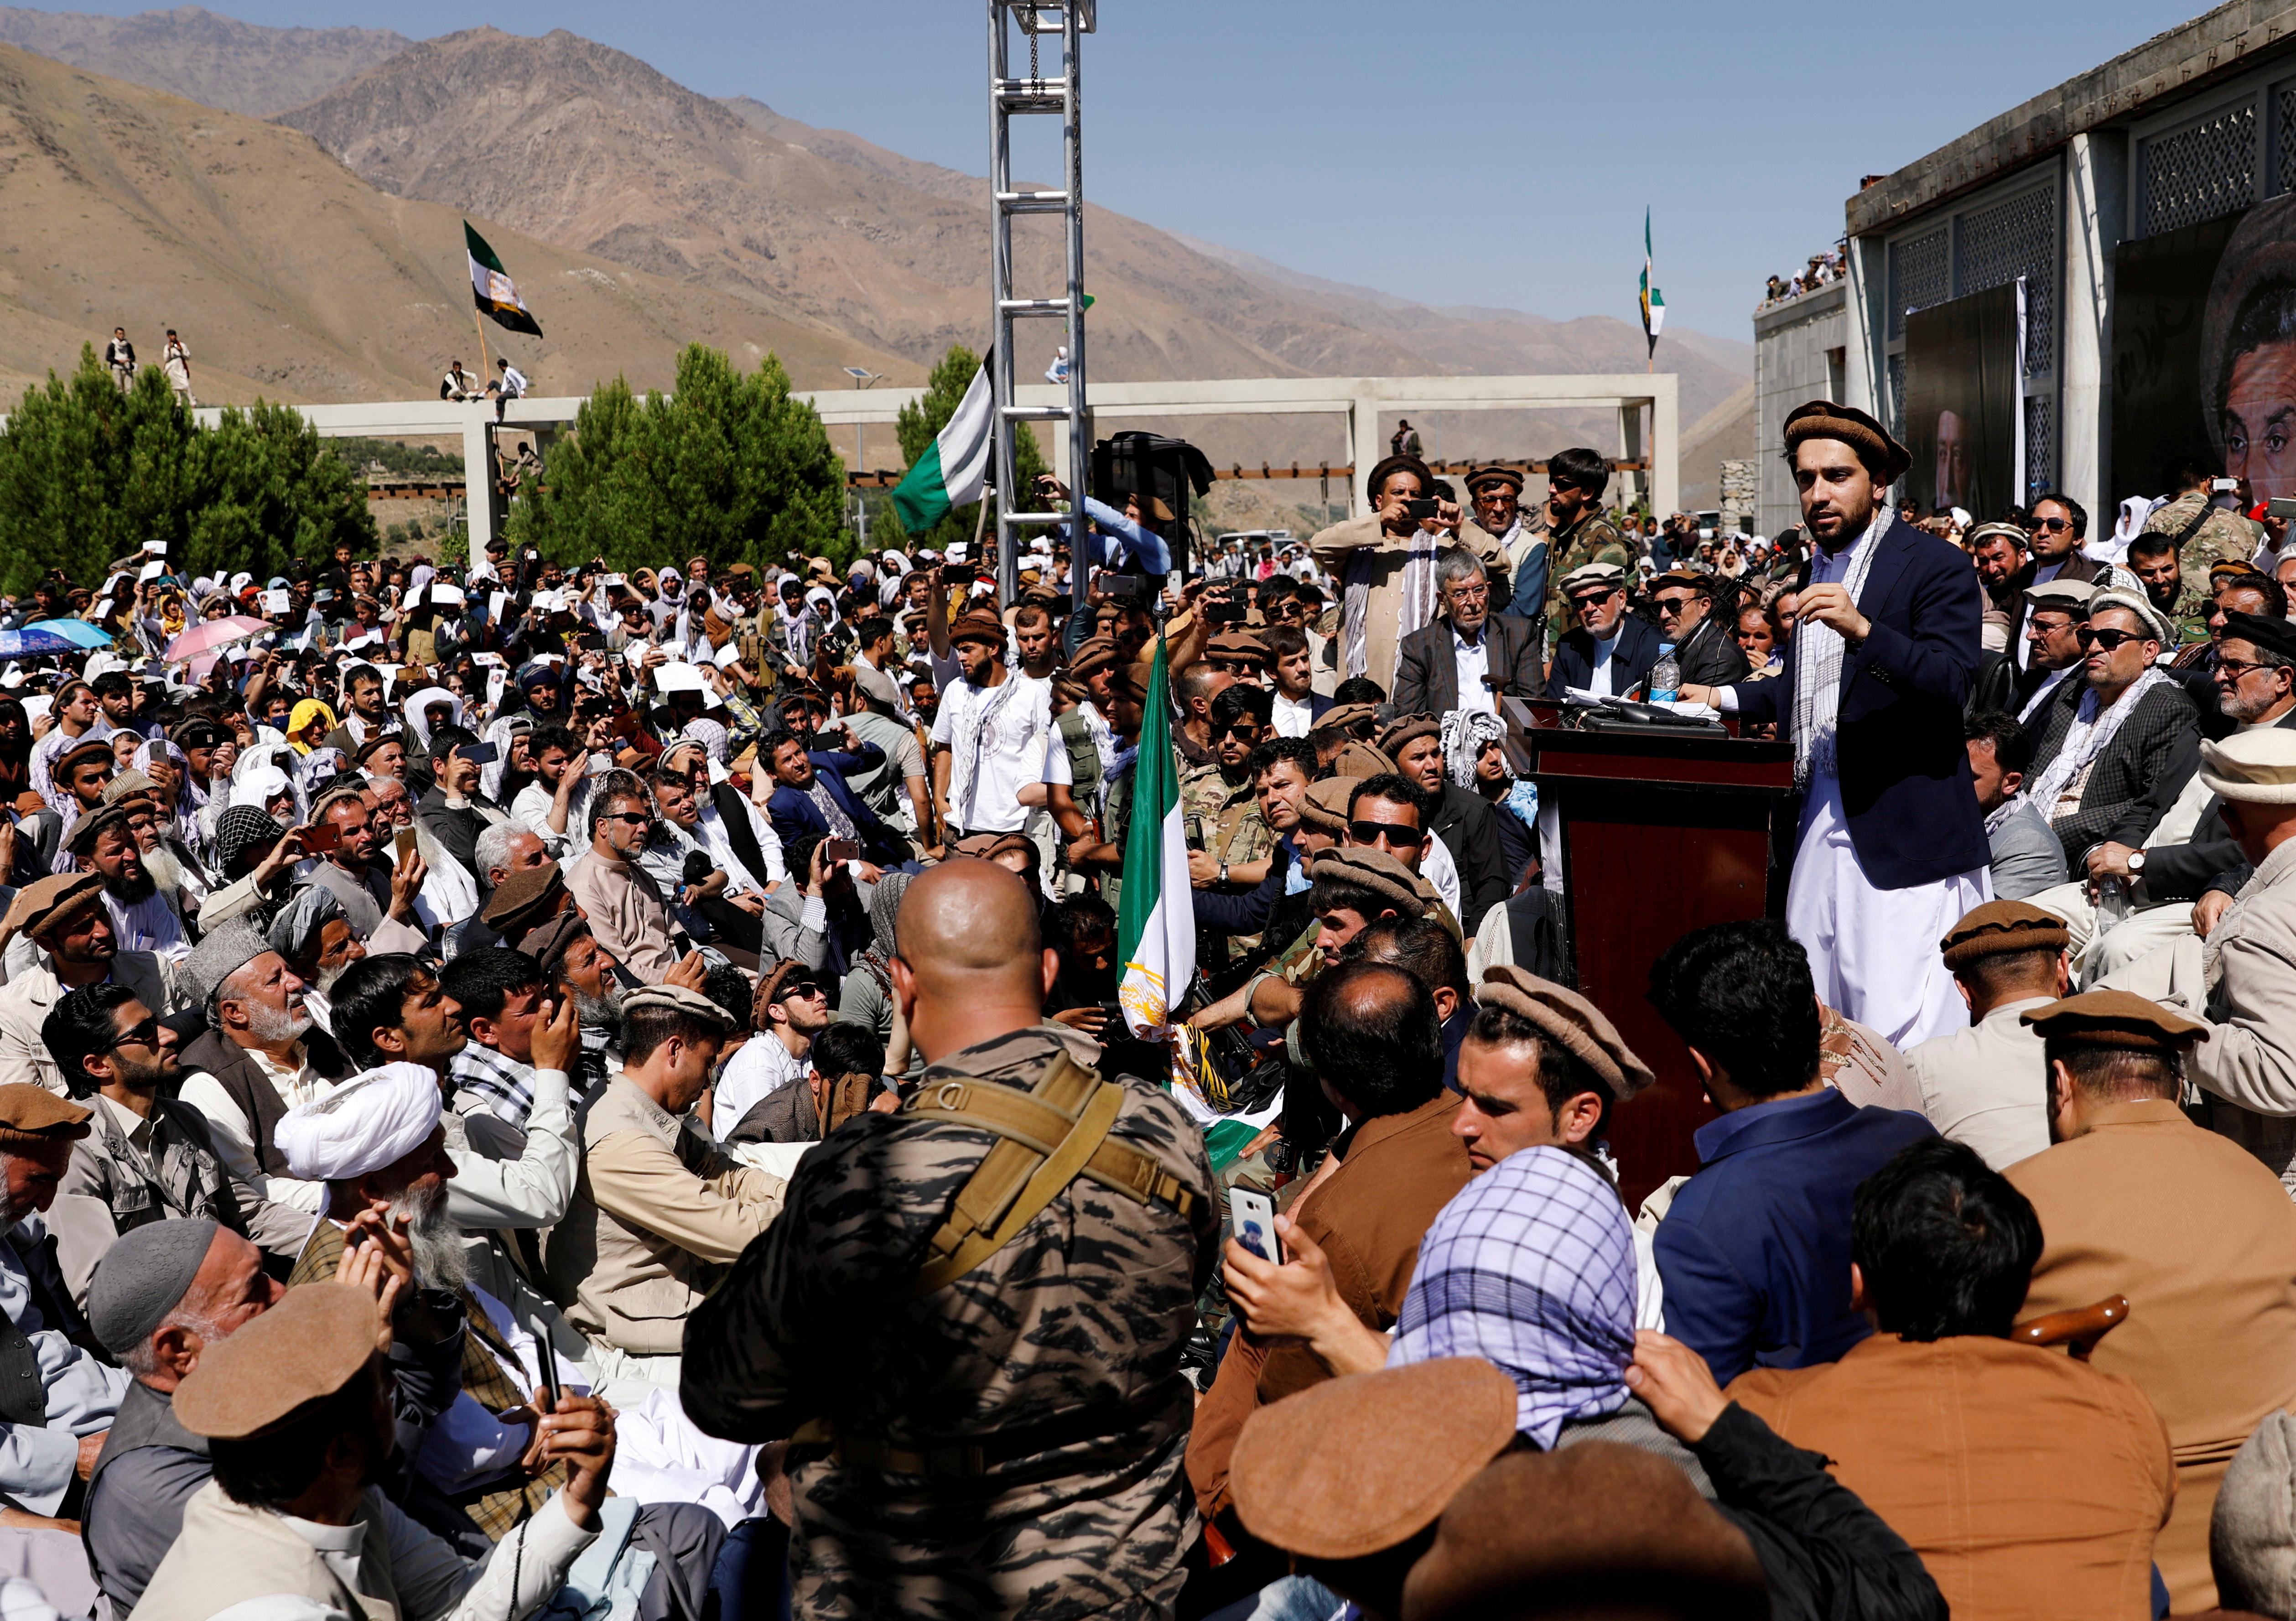 Ahmad Massoud, son of the slain hero of the anti-Soviet resistance Ahmad Shah Massoud, speaks to his supporters in Bazarak, Panjshir province Afghanistan September 5, 2019. REUTERS/Mohammad Ismail